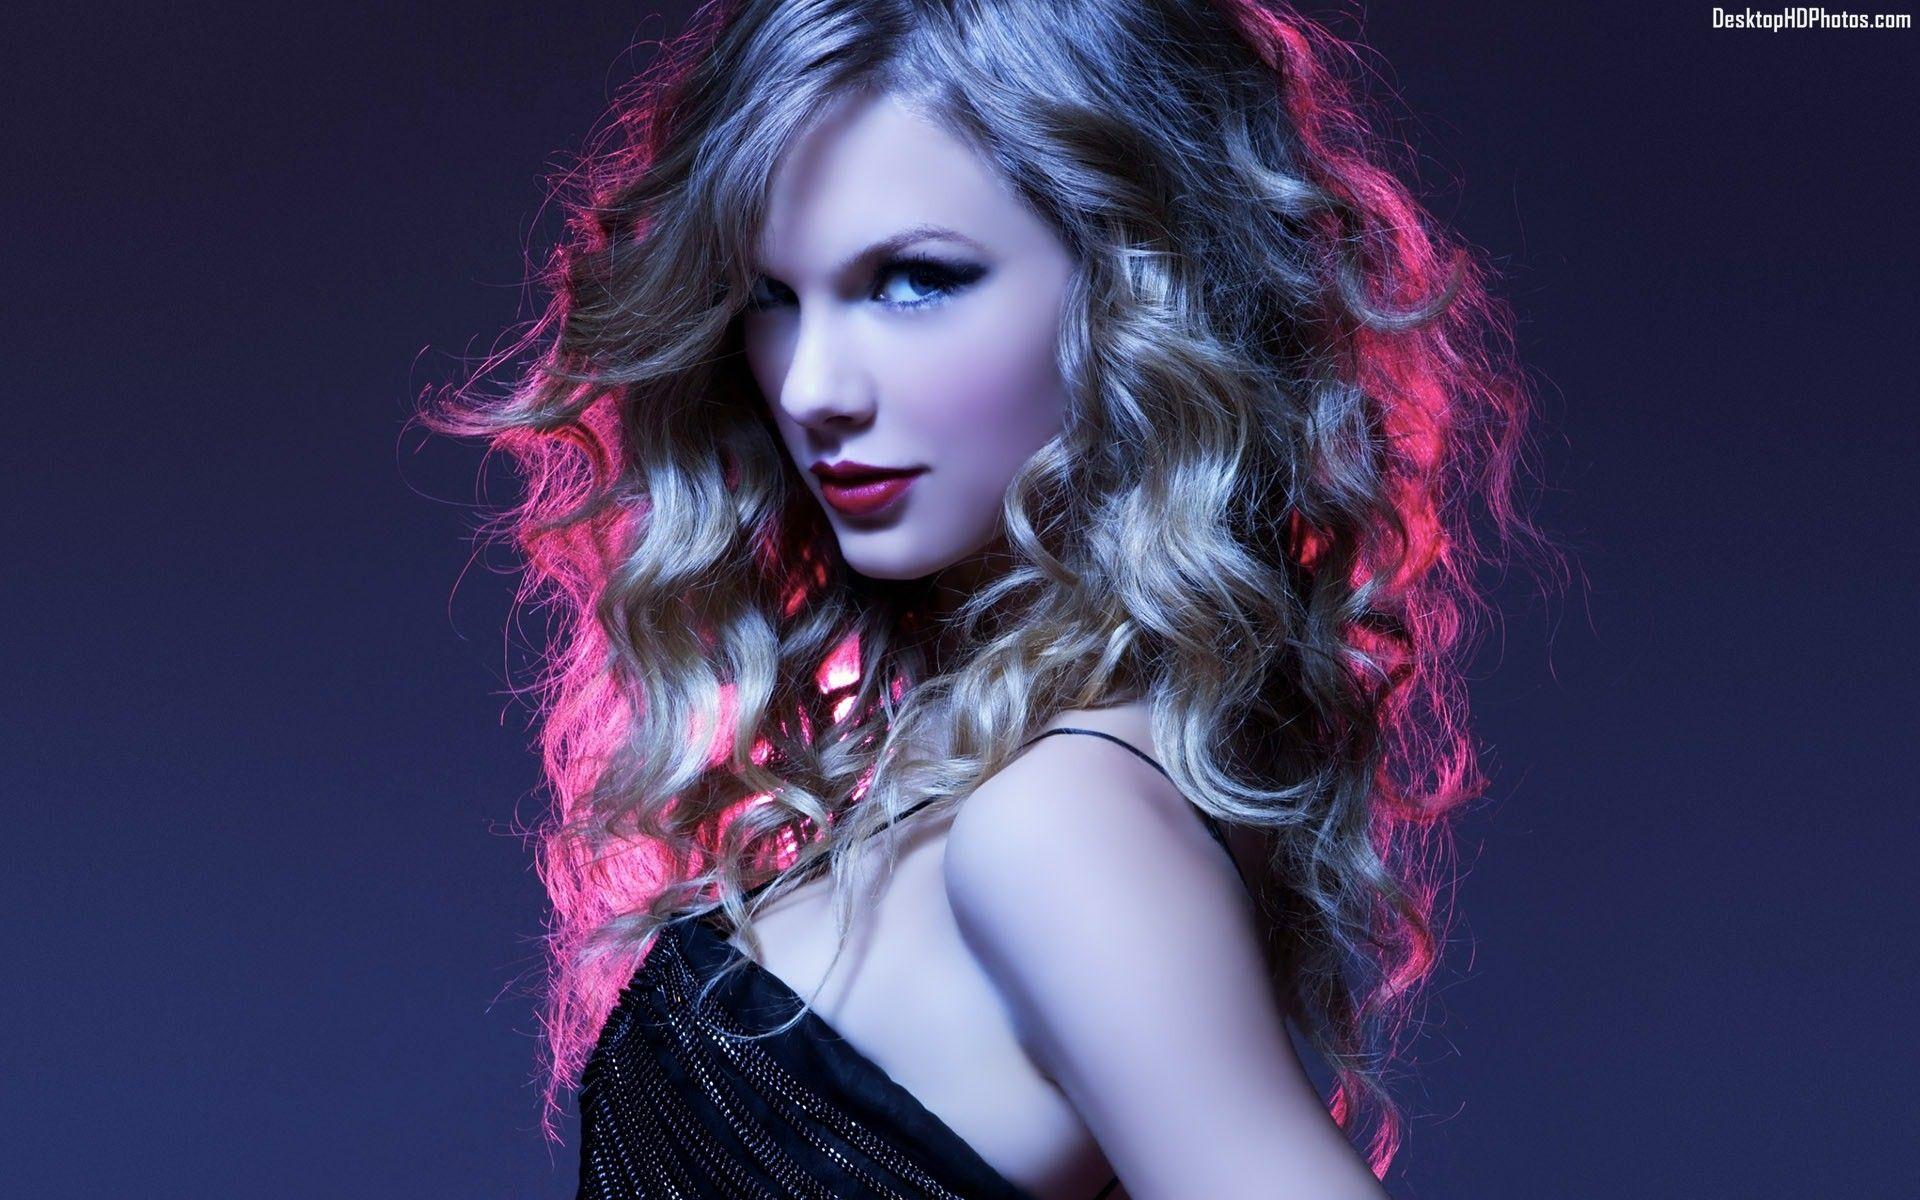 Taylor Swift 2015 HD Photoshoot